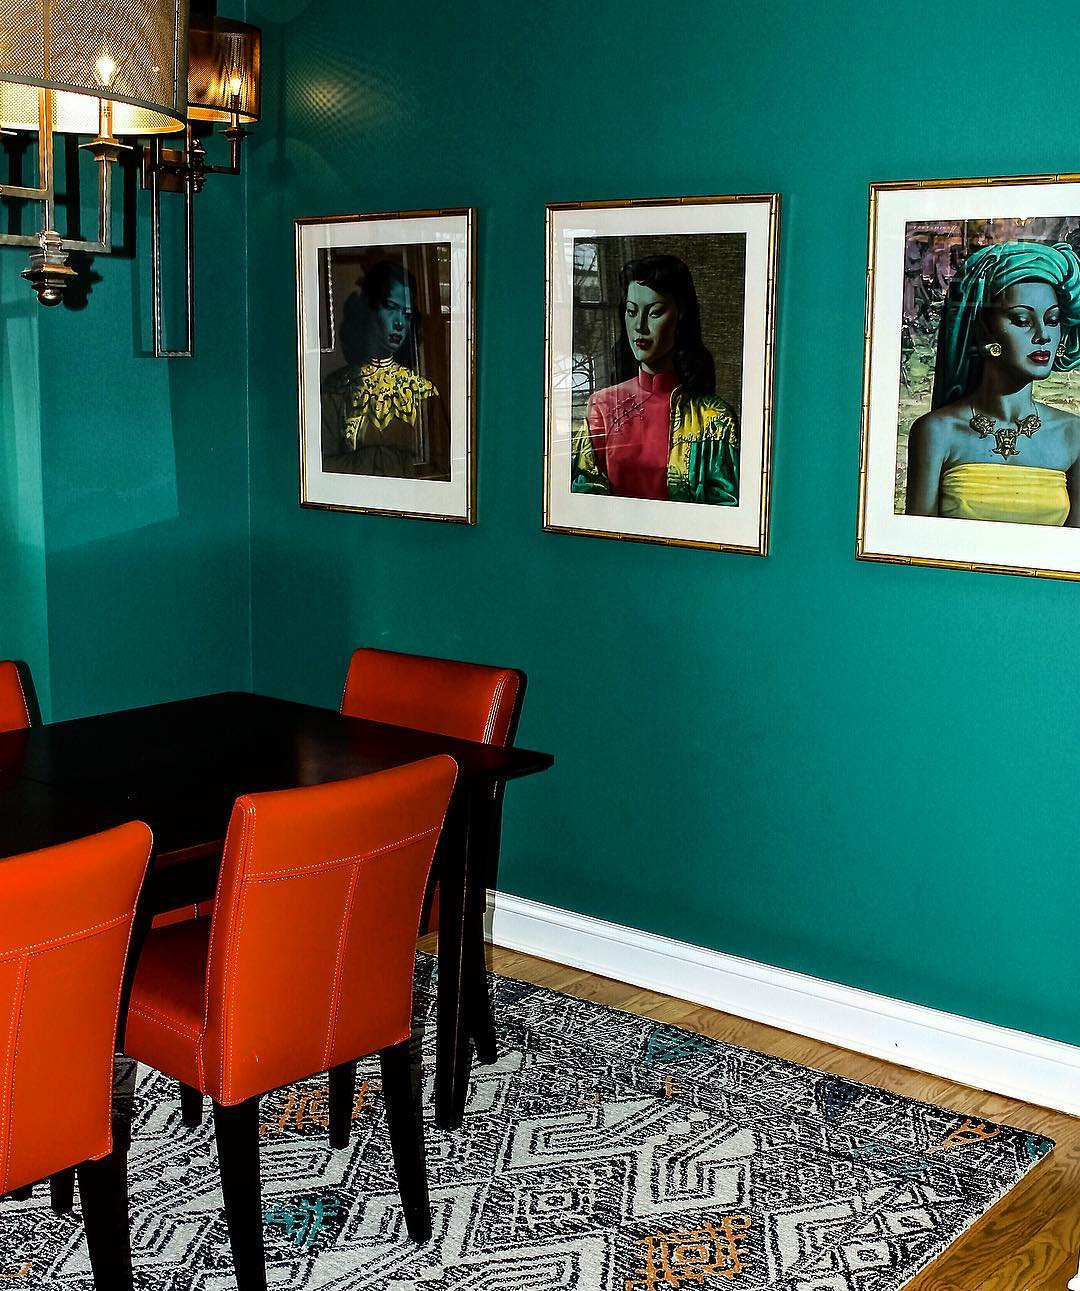 Purple And Black Bedroom Wallpaper Benjamin Moore Steamed Spinach Dining Room Walls